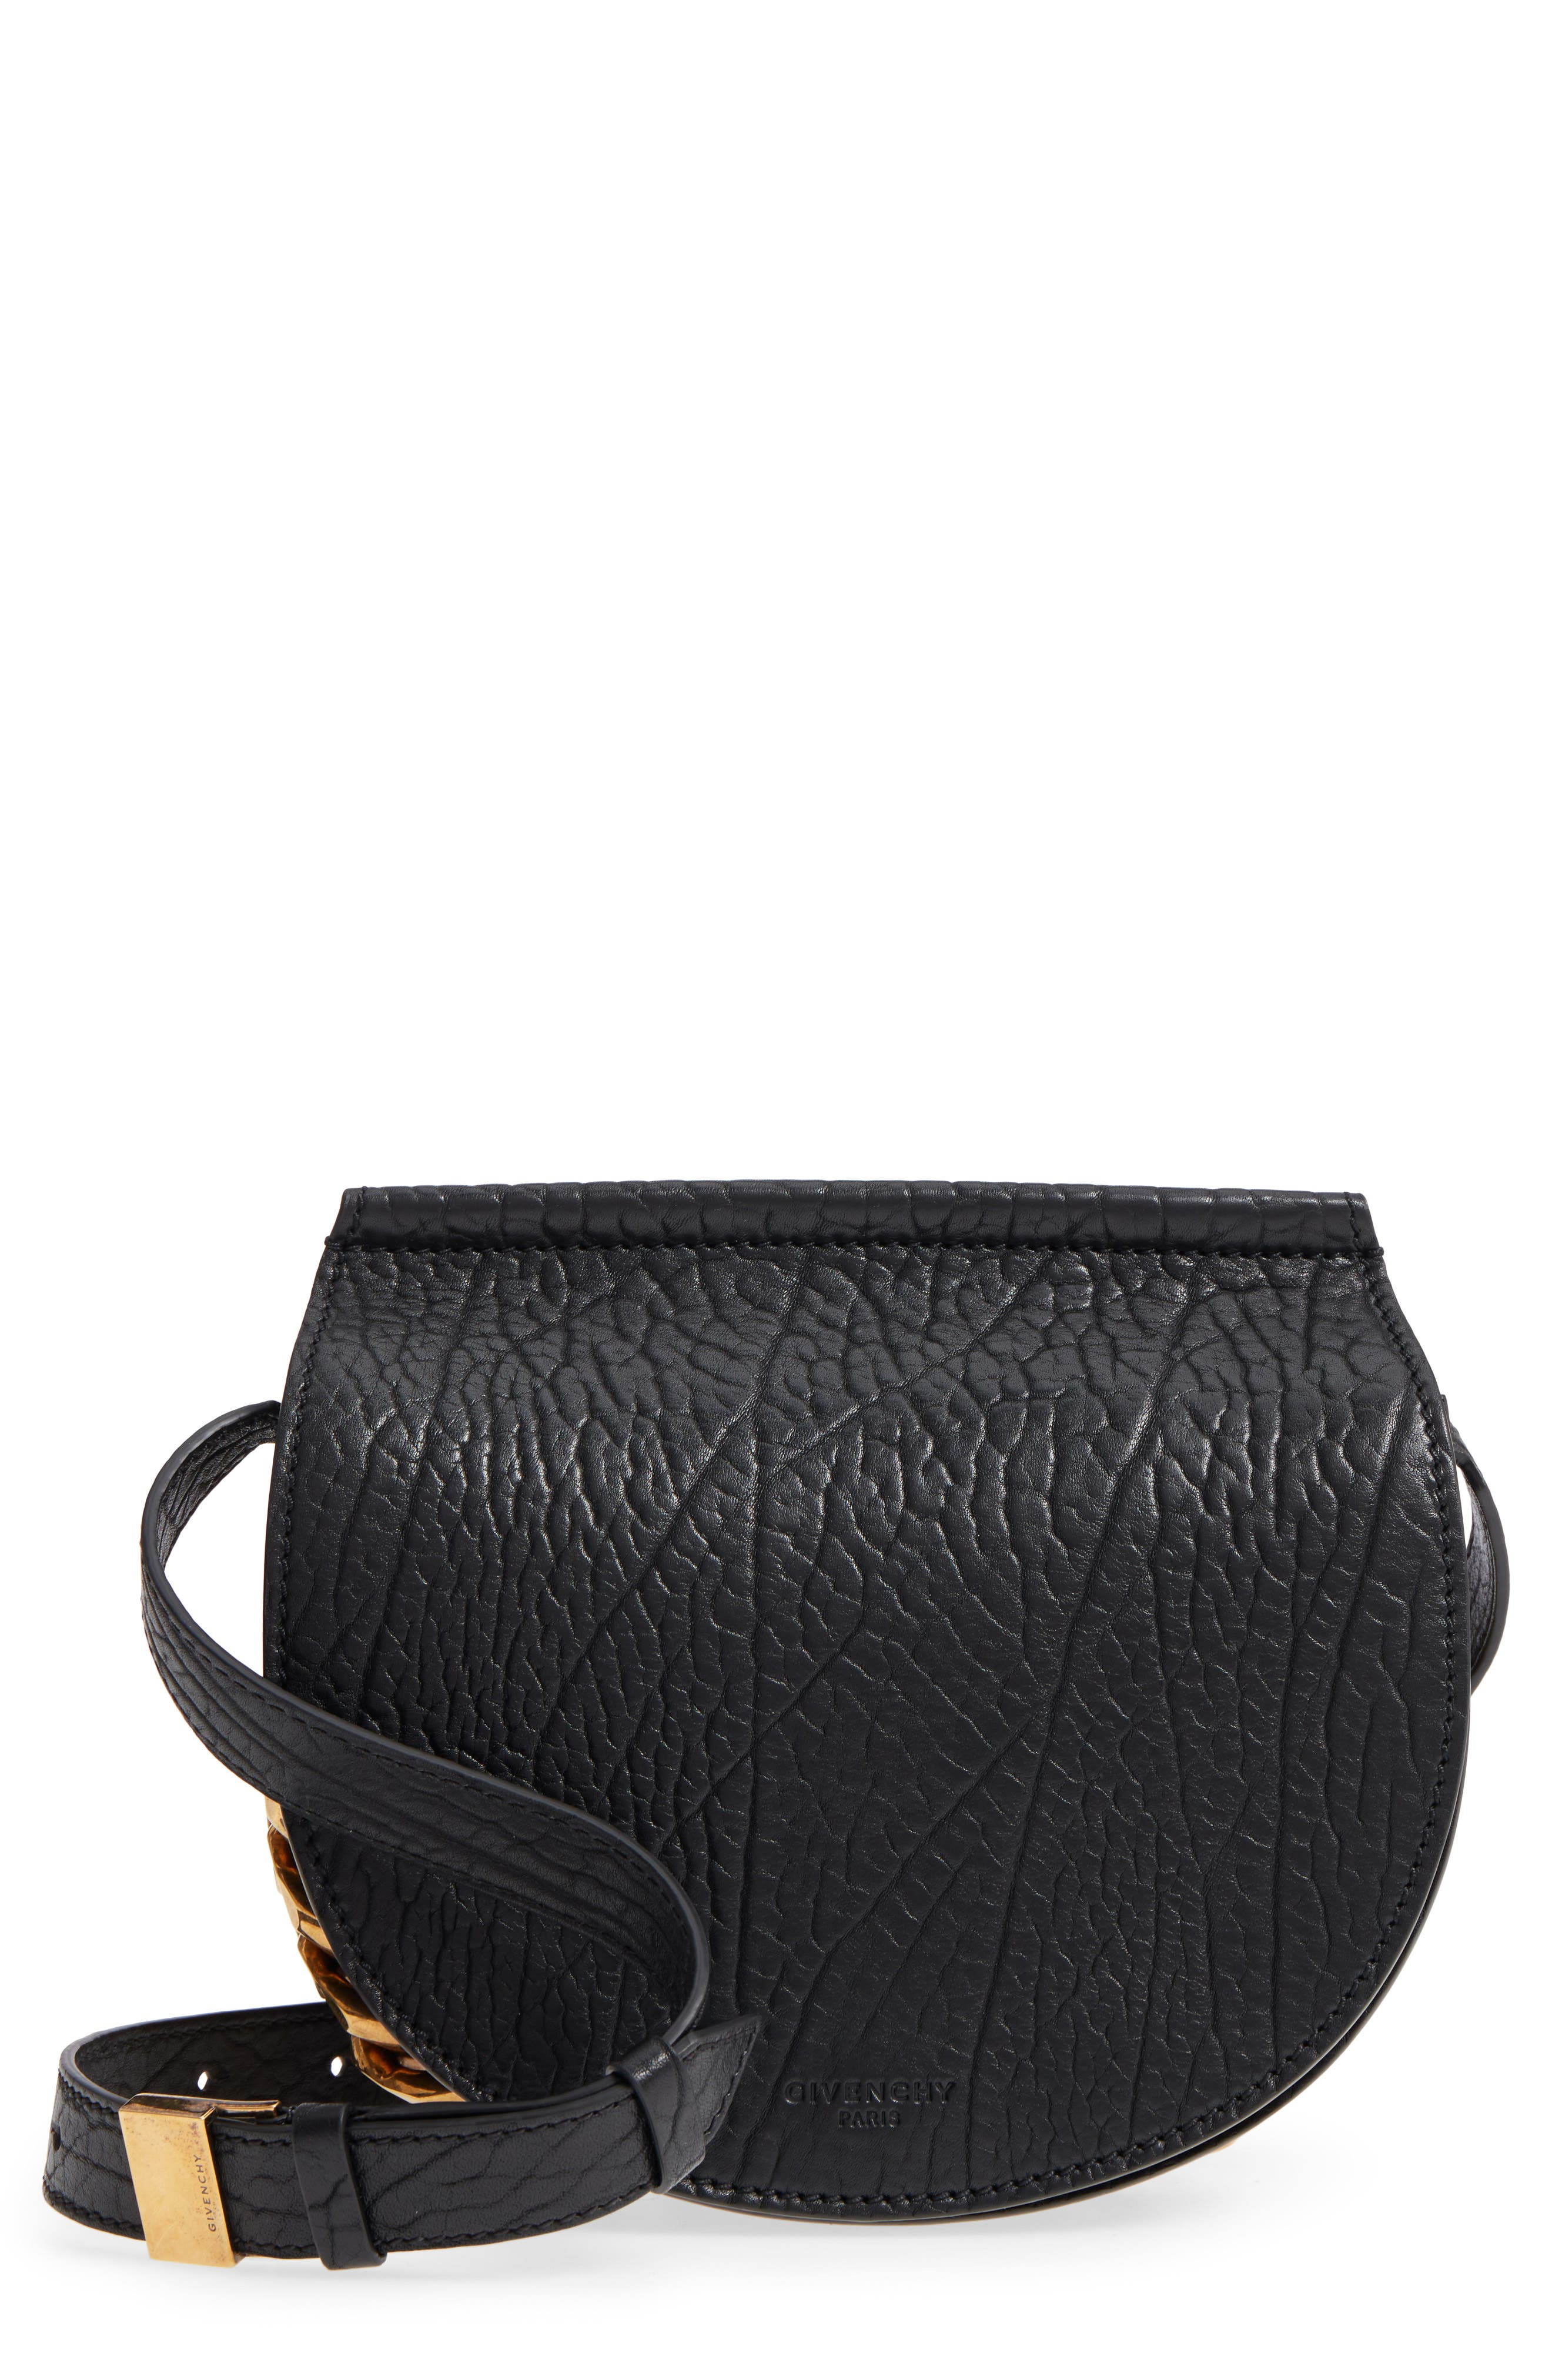 Infinity Calfskin Leather Saddle Bag,                         Main,                         color, 001